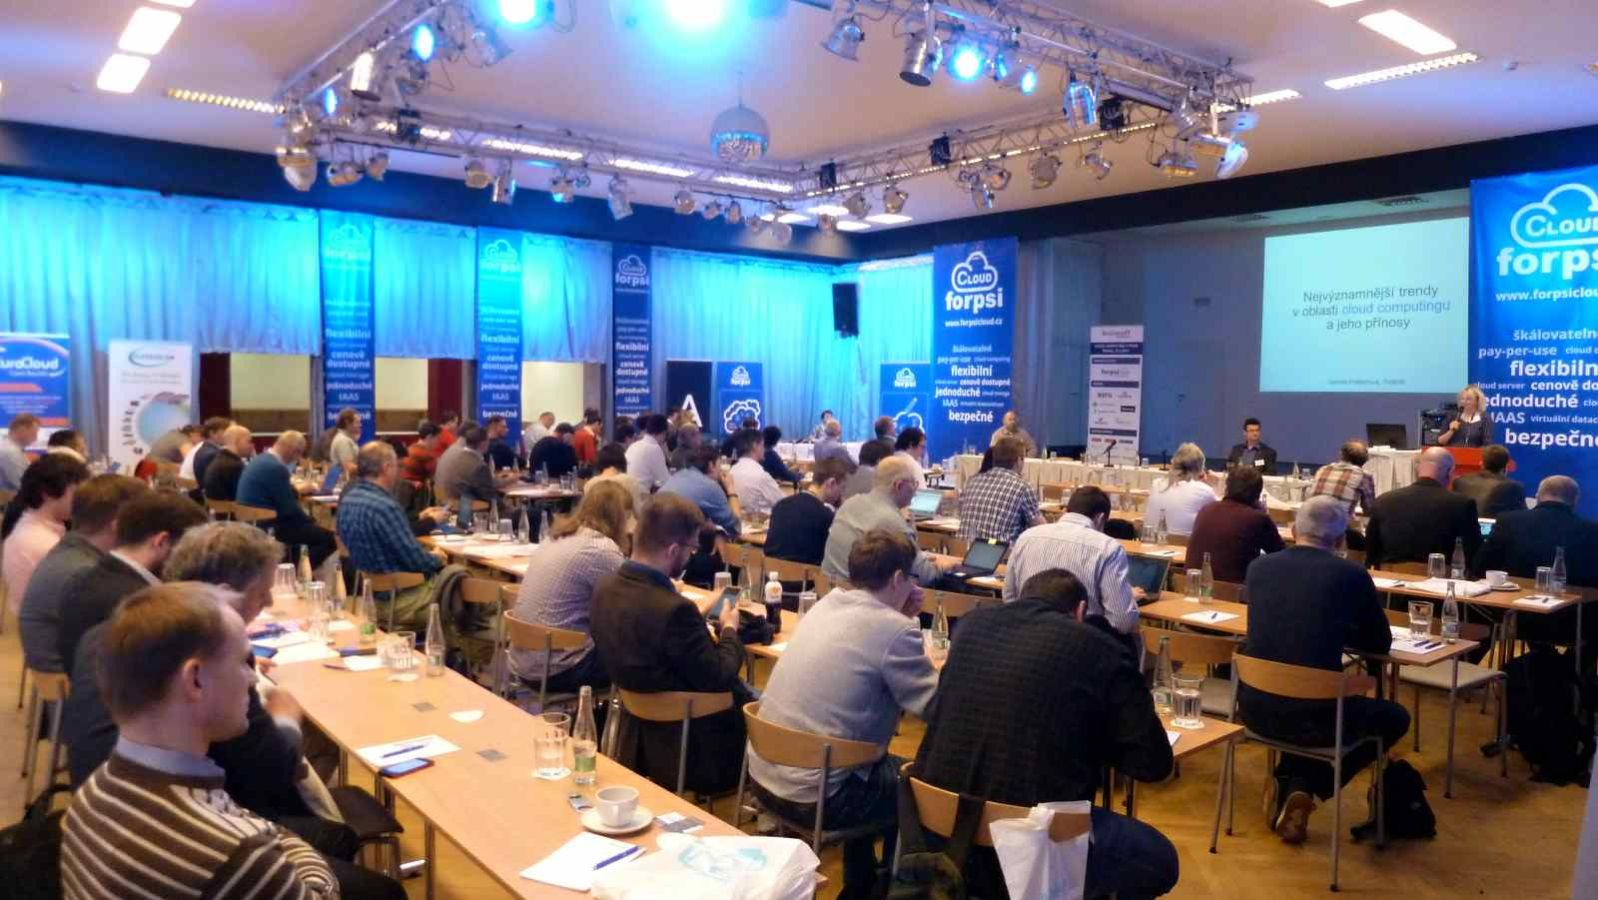 Cloud computing konference